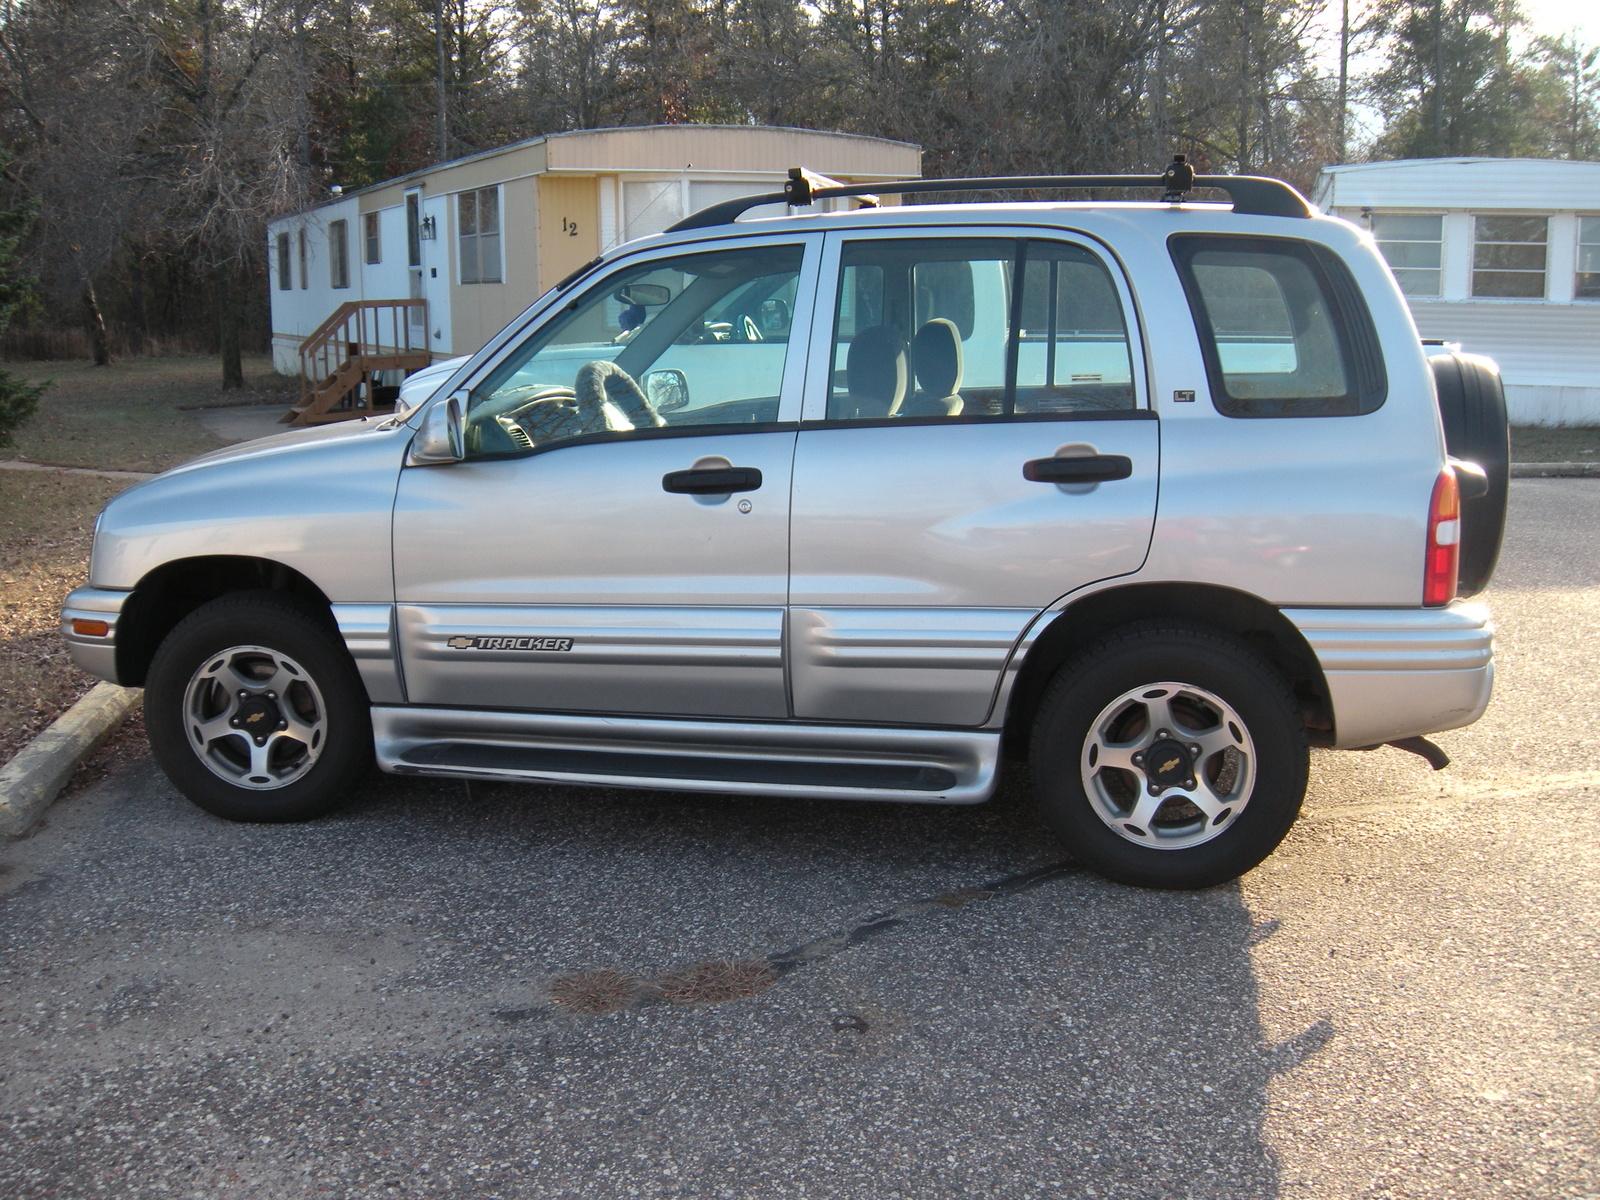 Chevrolet Tracker 2002 foto - 1